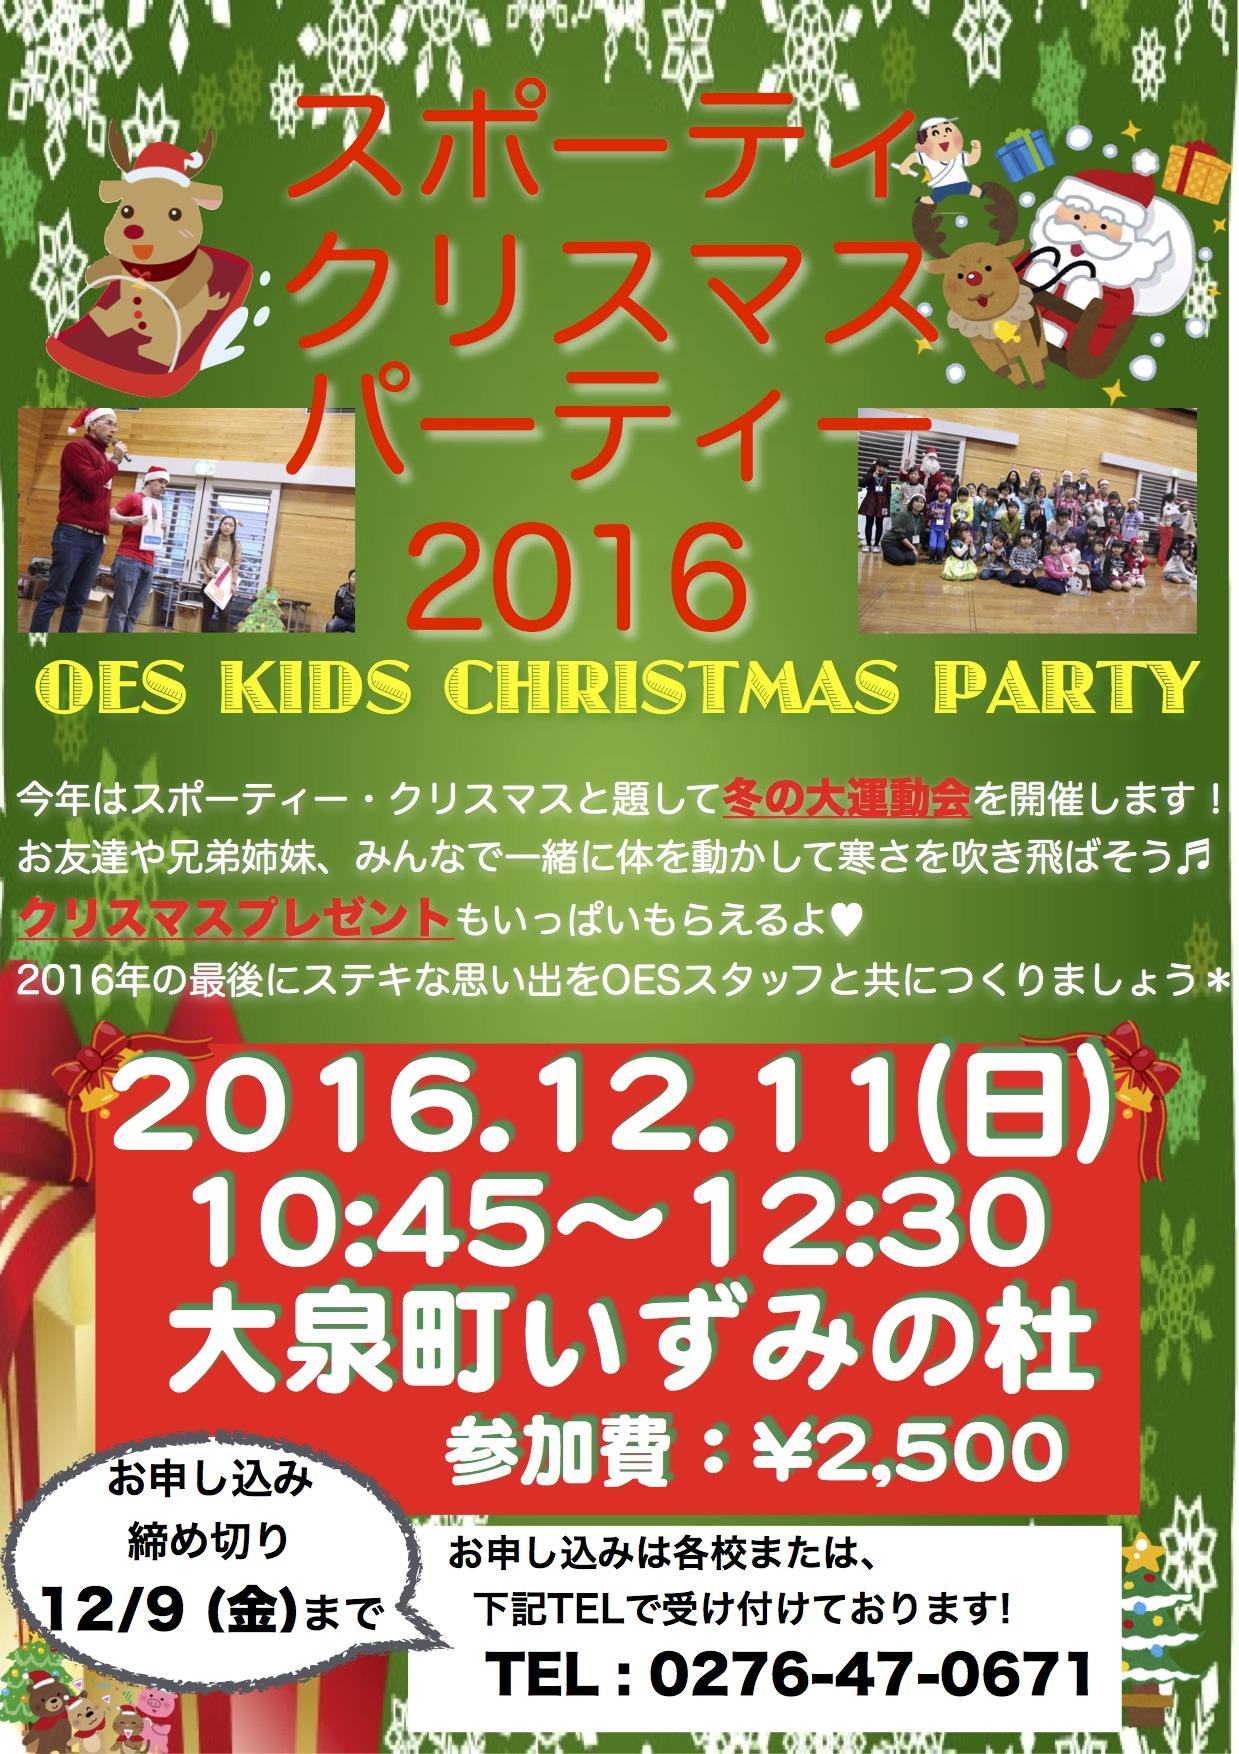 Christmas Party2016 ぽすた修正版第2弾 のコピー